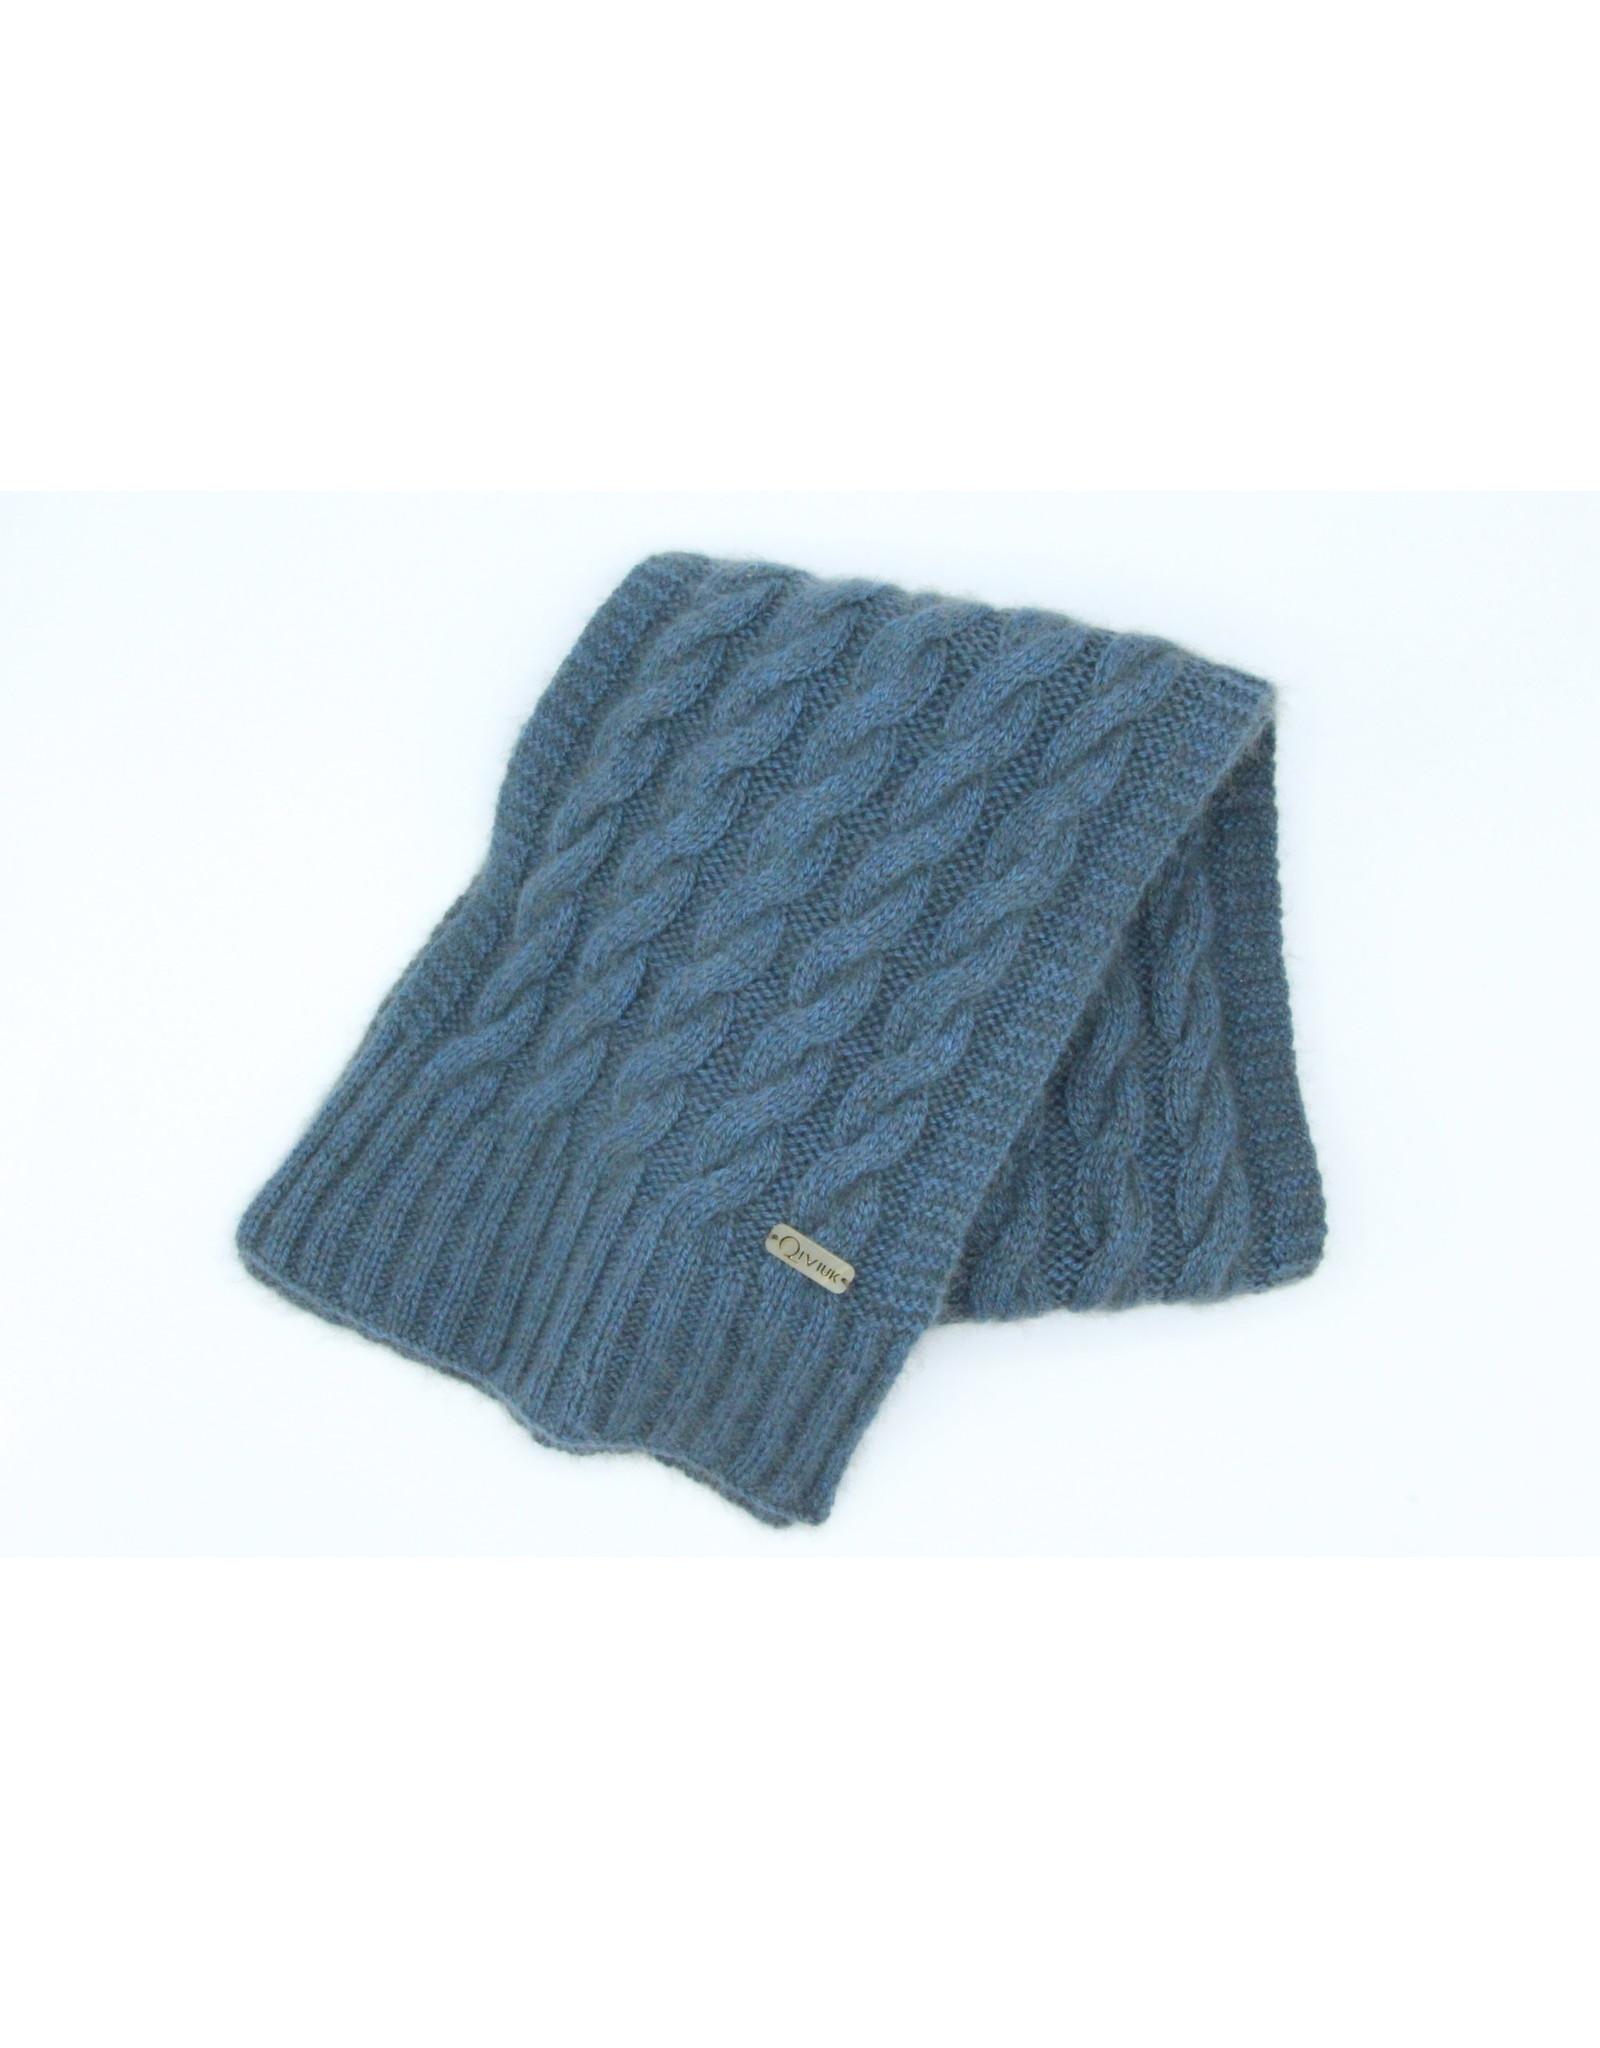 Cable Scarf - 100% Qiviuk